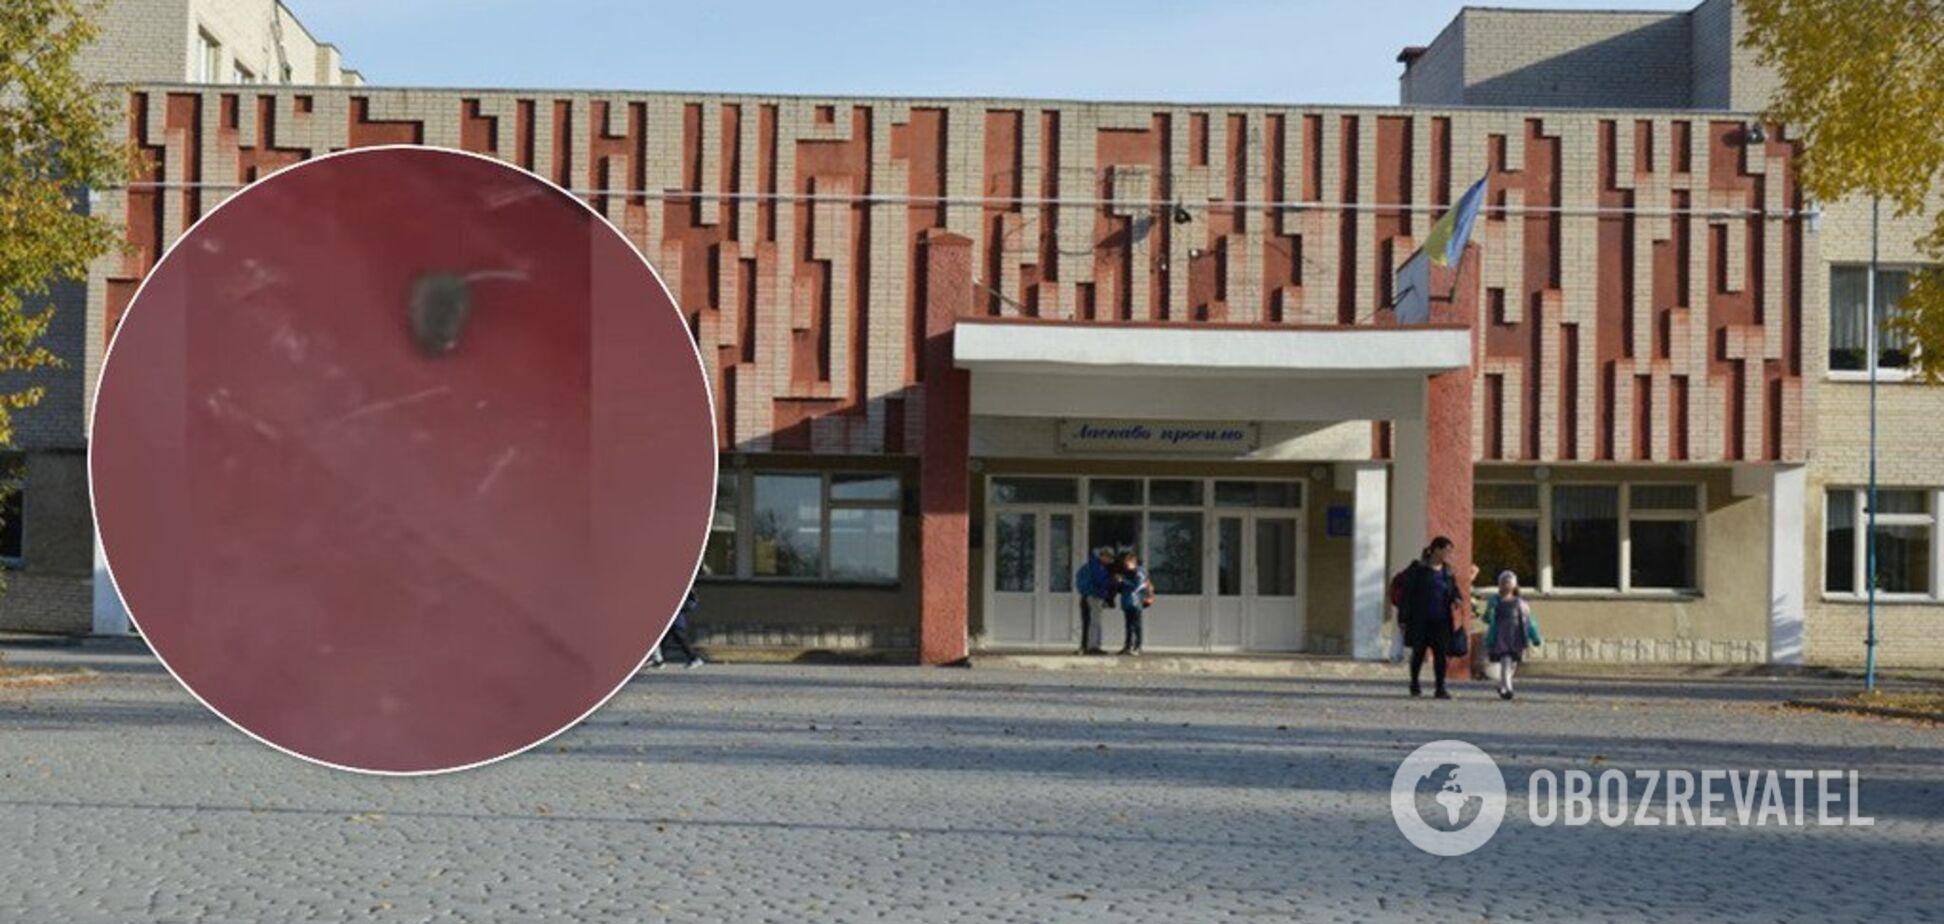 Діти ловлять їх руками: у Луцьку школа потрапила в скандал через мишей